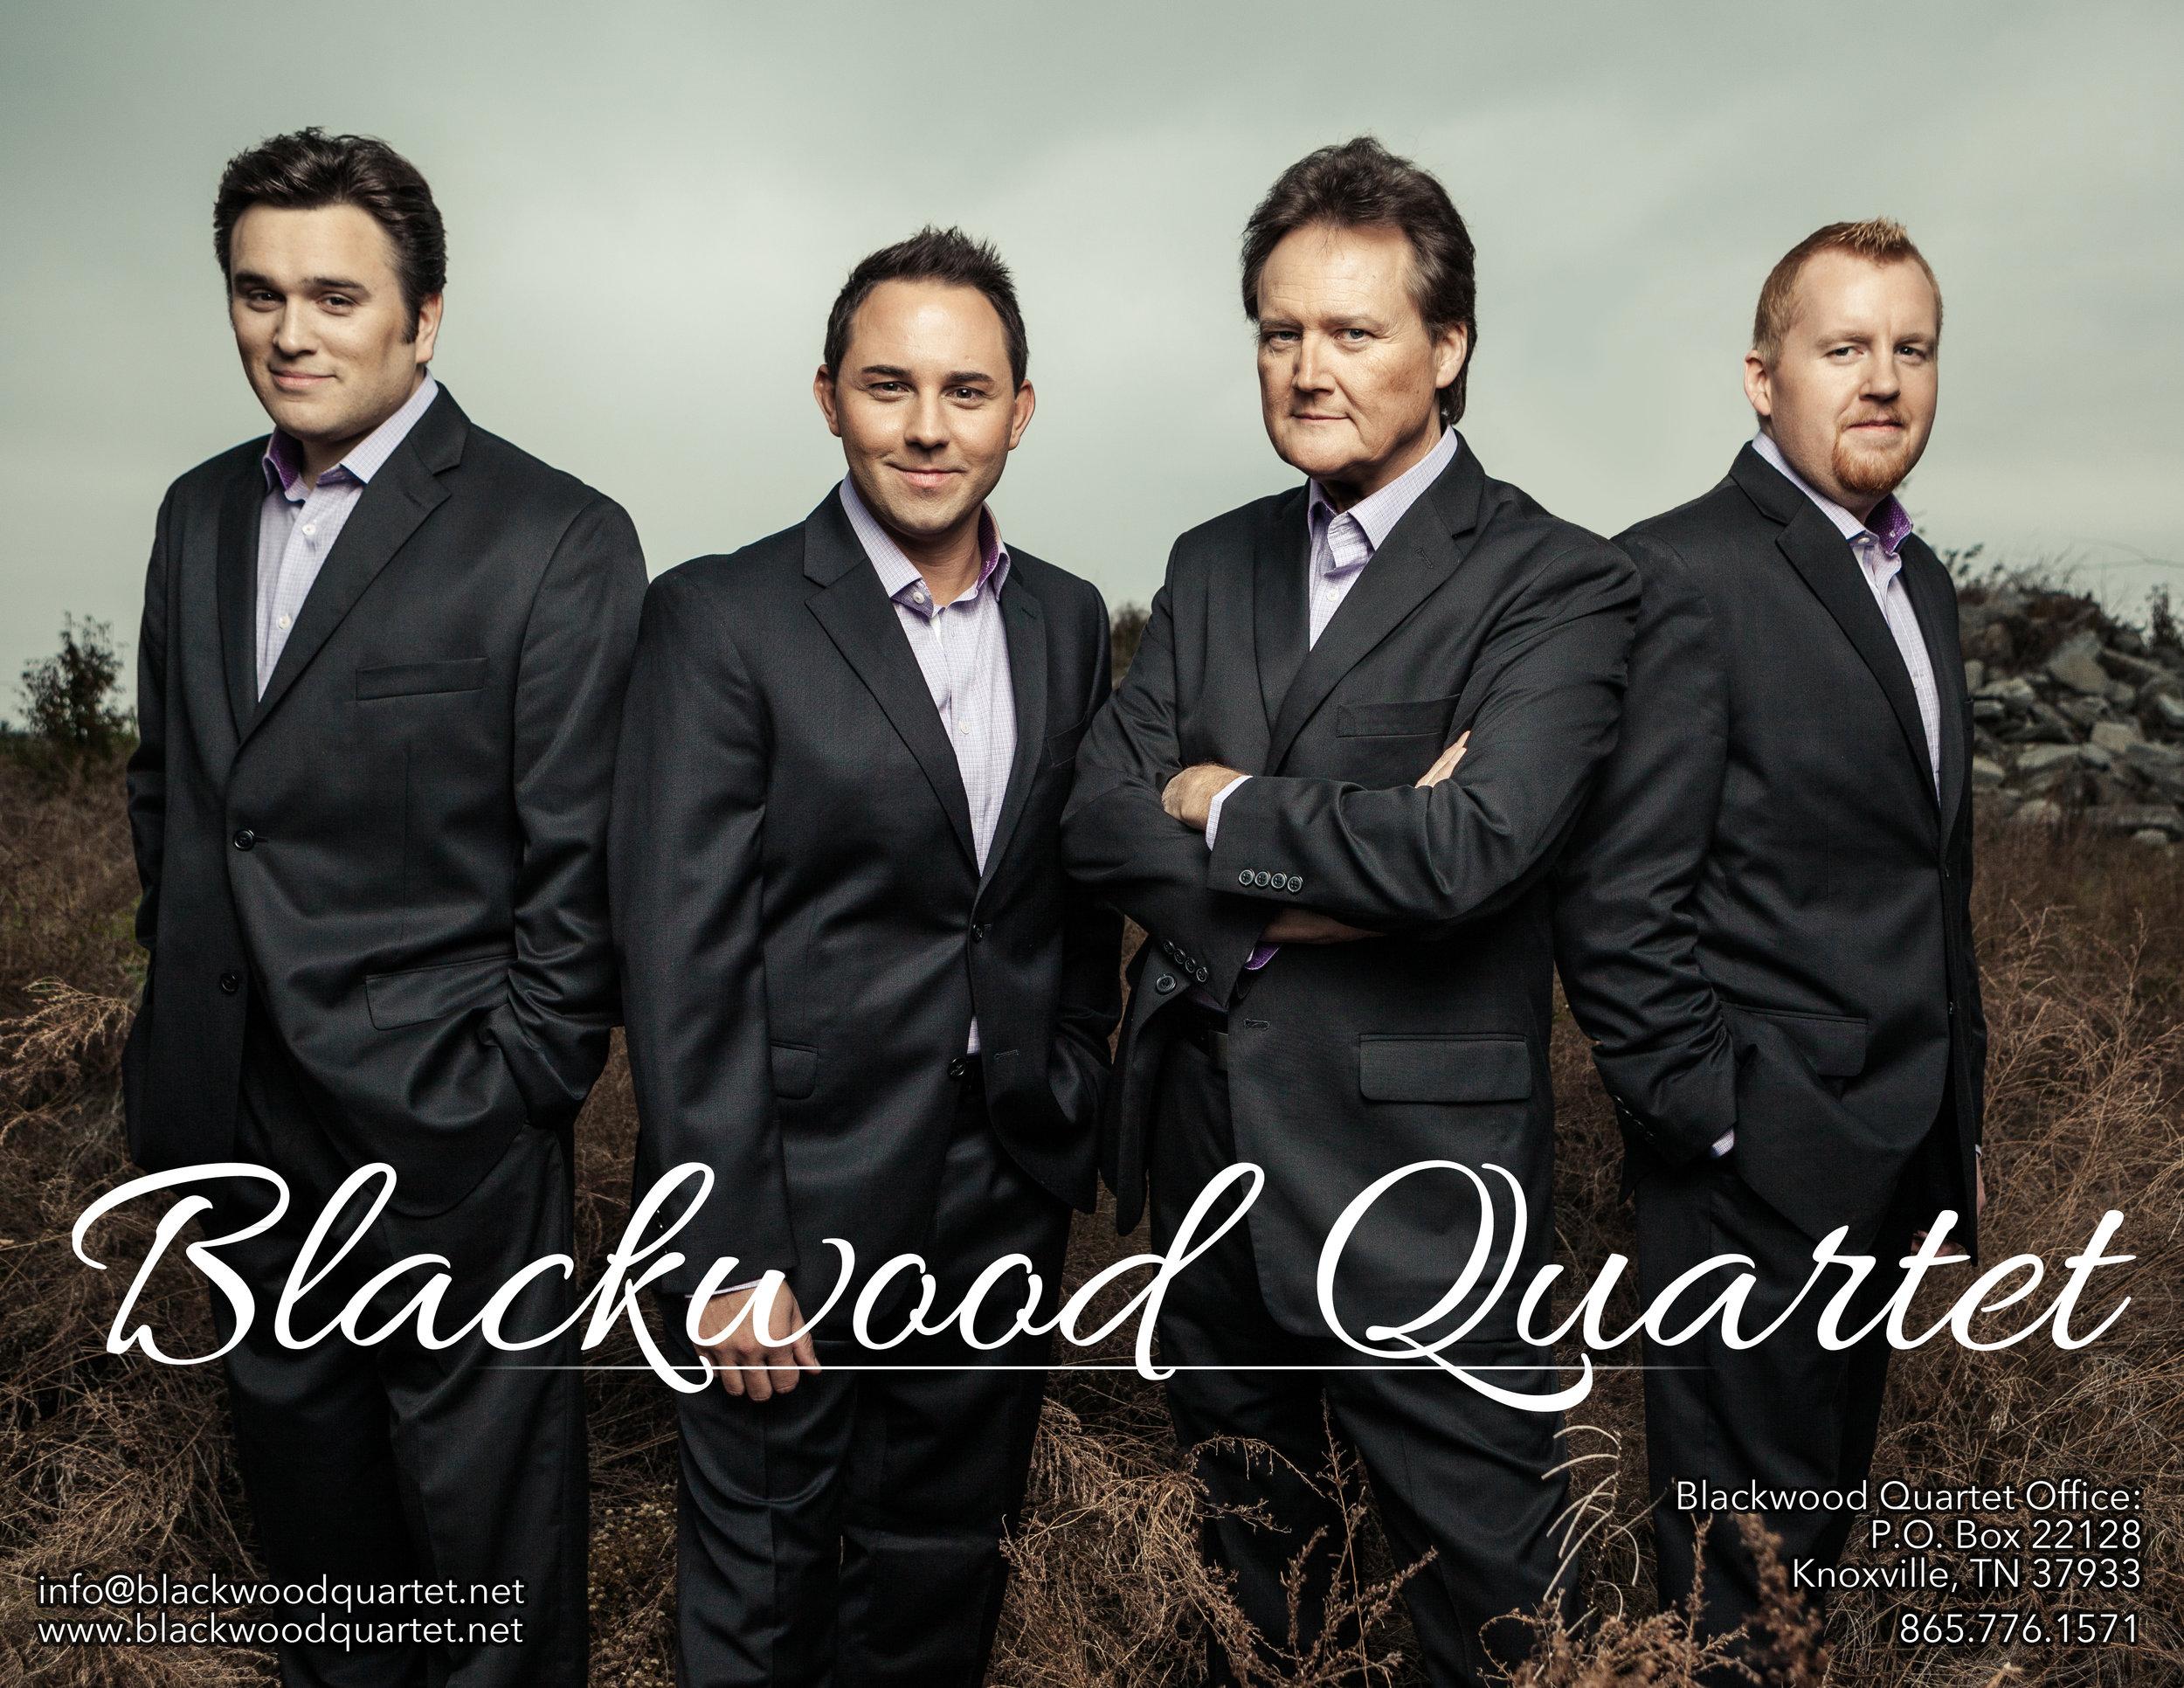 Blackwood quartet with logo.jpg